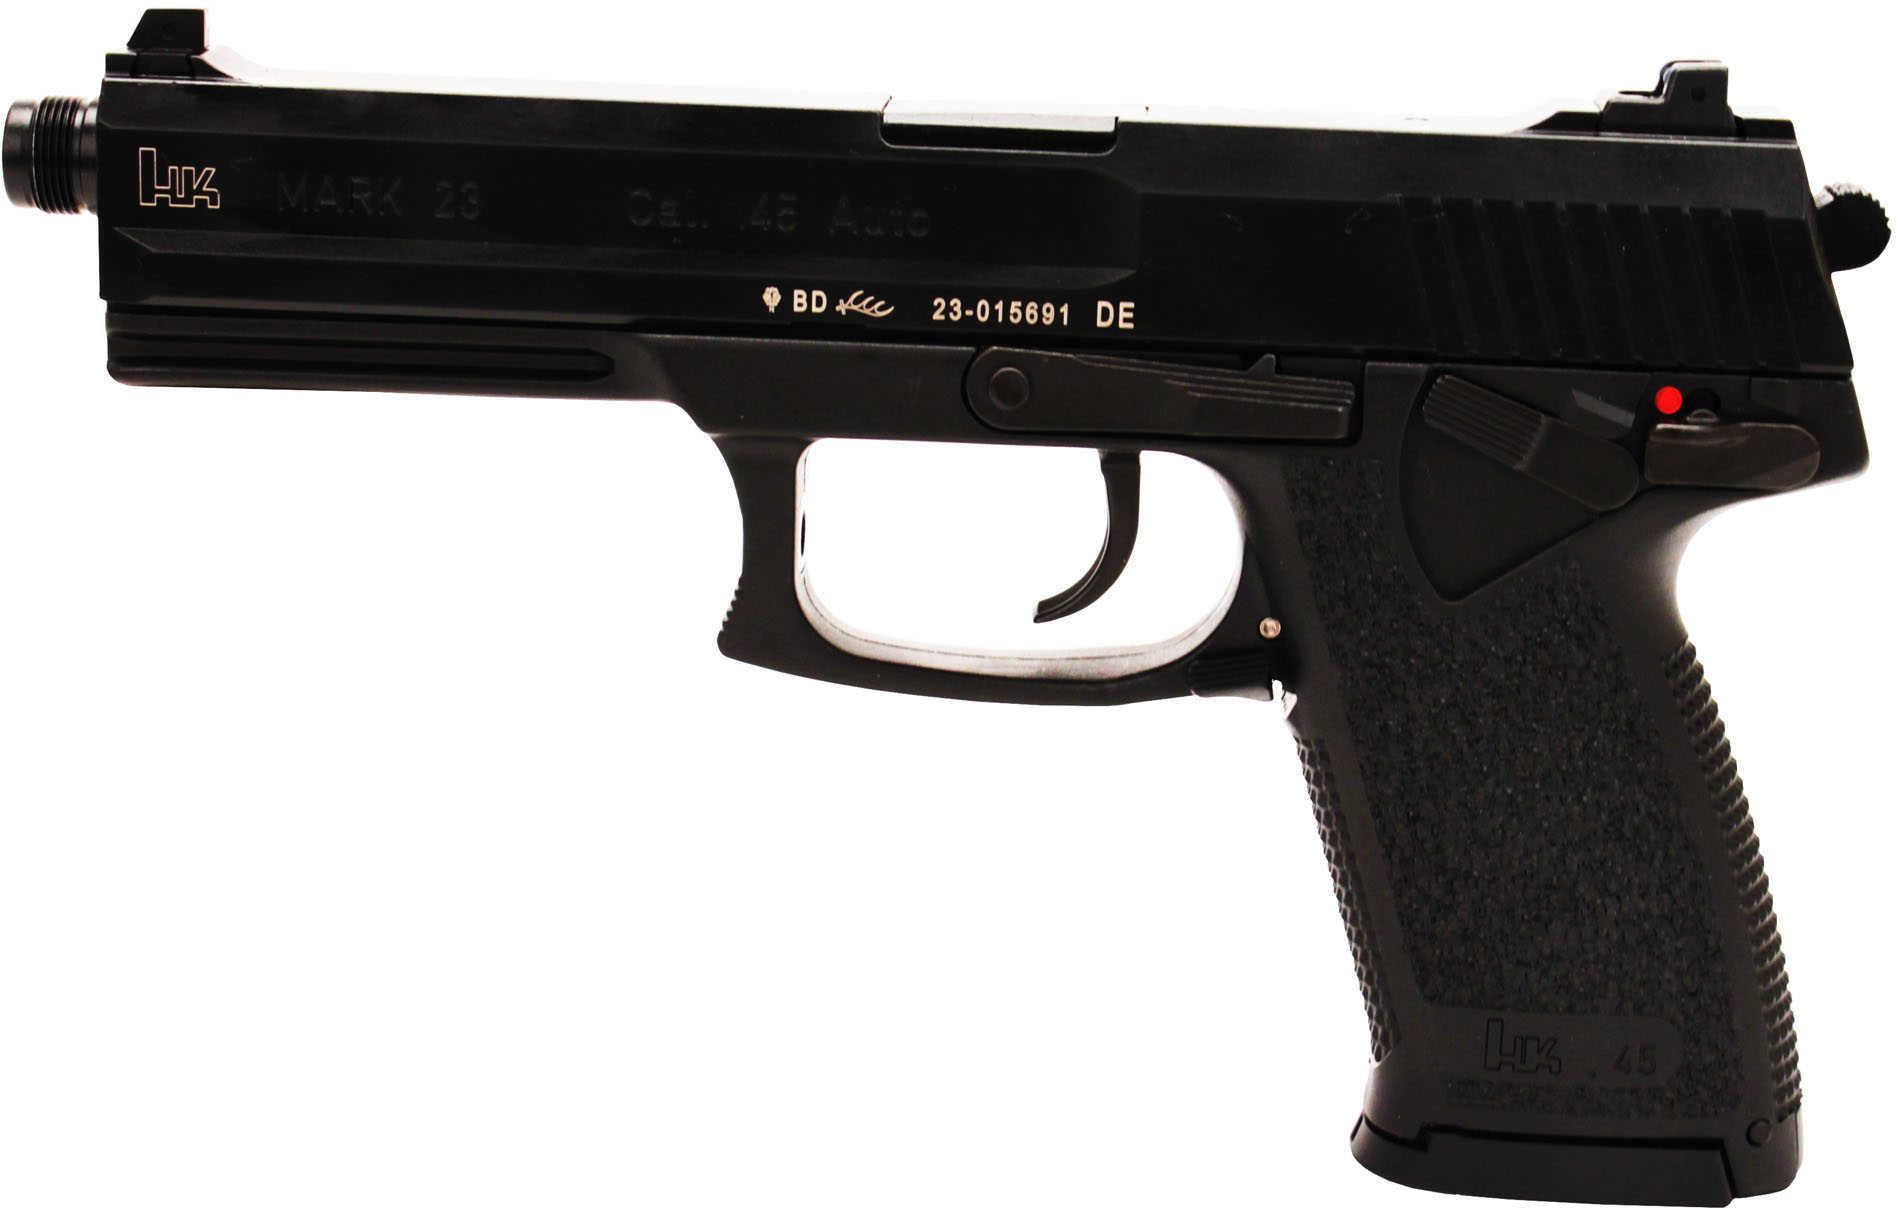 Heckler & Koch Mark 23 45 ACP 2-12 Round Mags Black Finish Semi Automatic Pisto l M723001